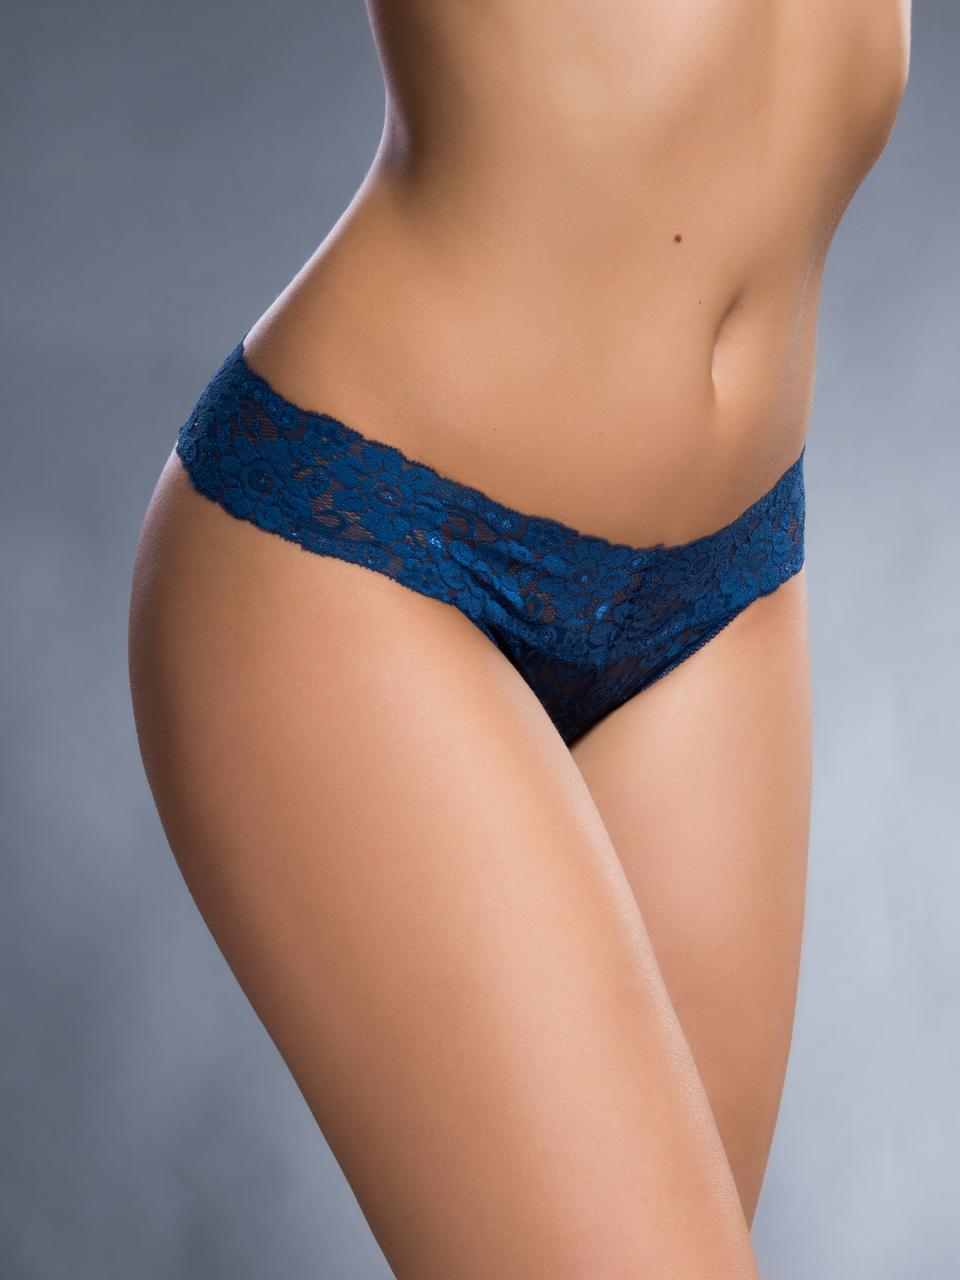 Трусики женские Acousma T6401H, цвет Темно-Синий, размер S